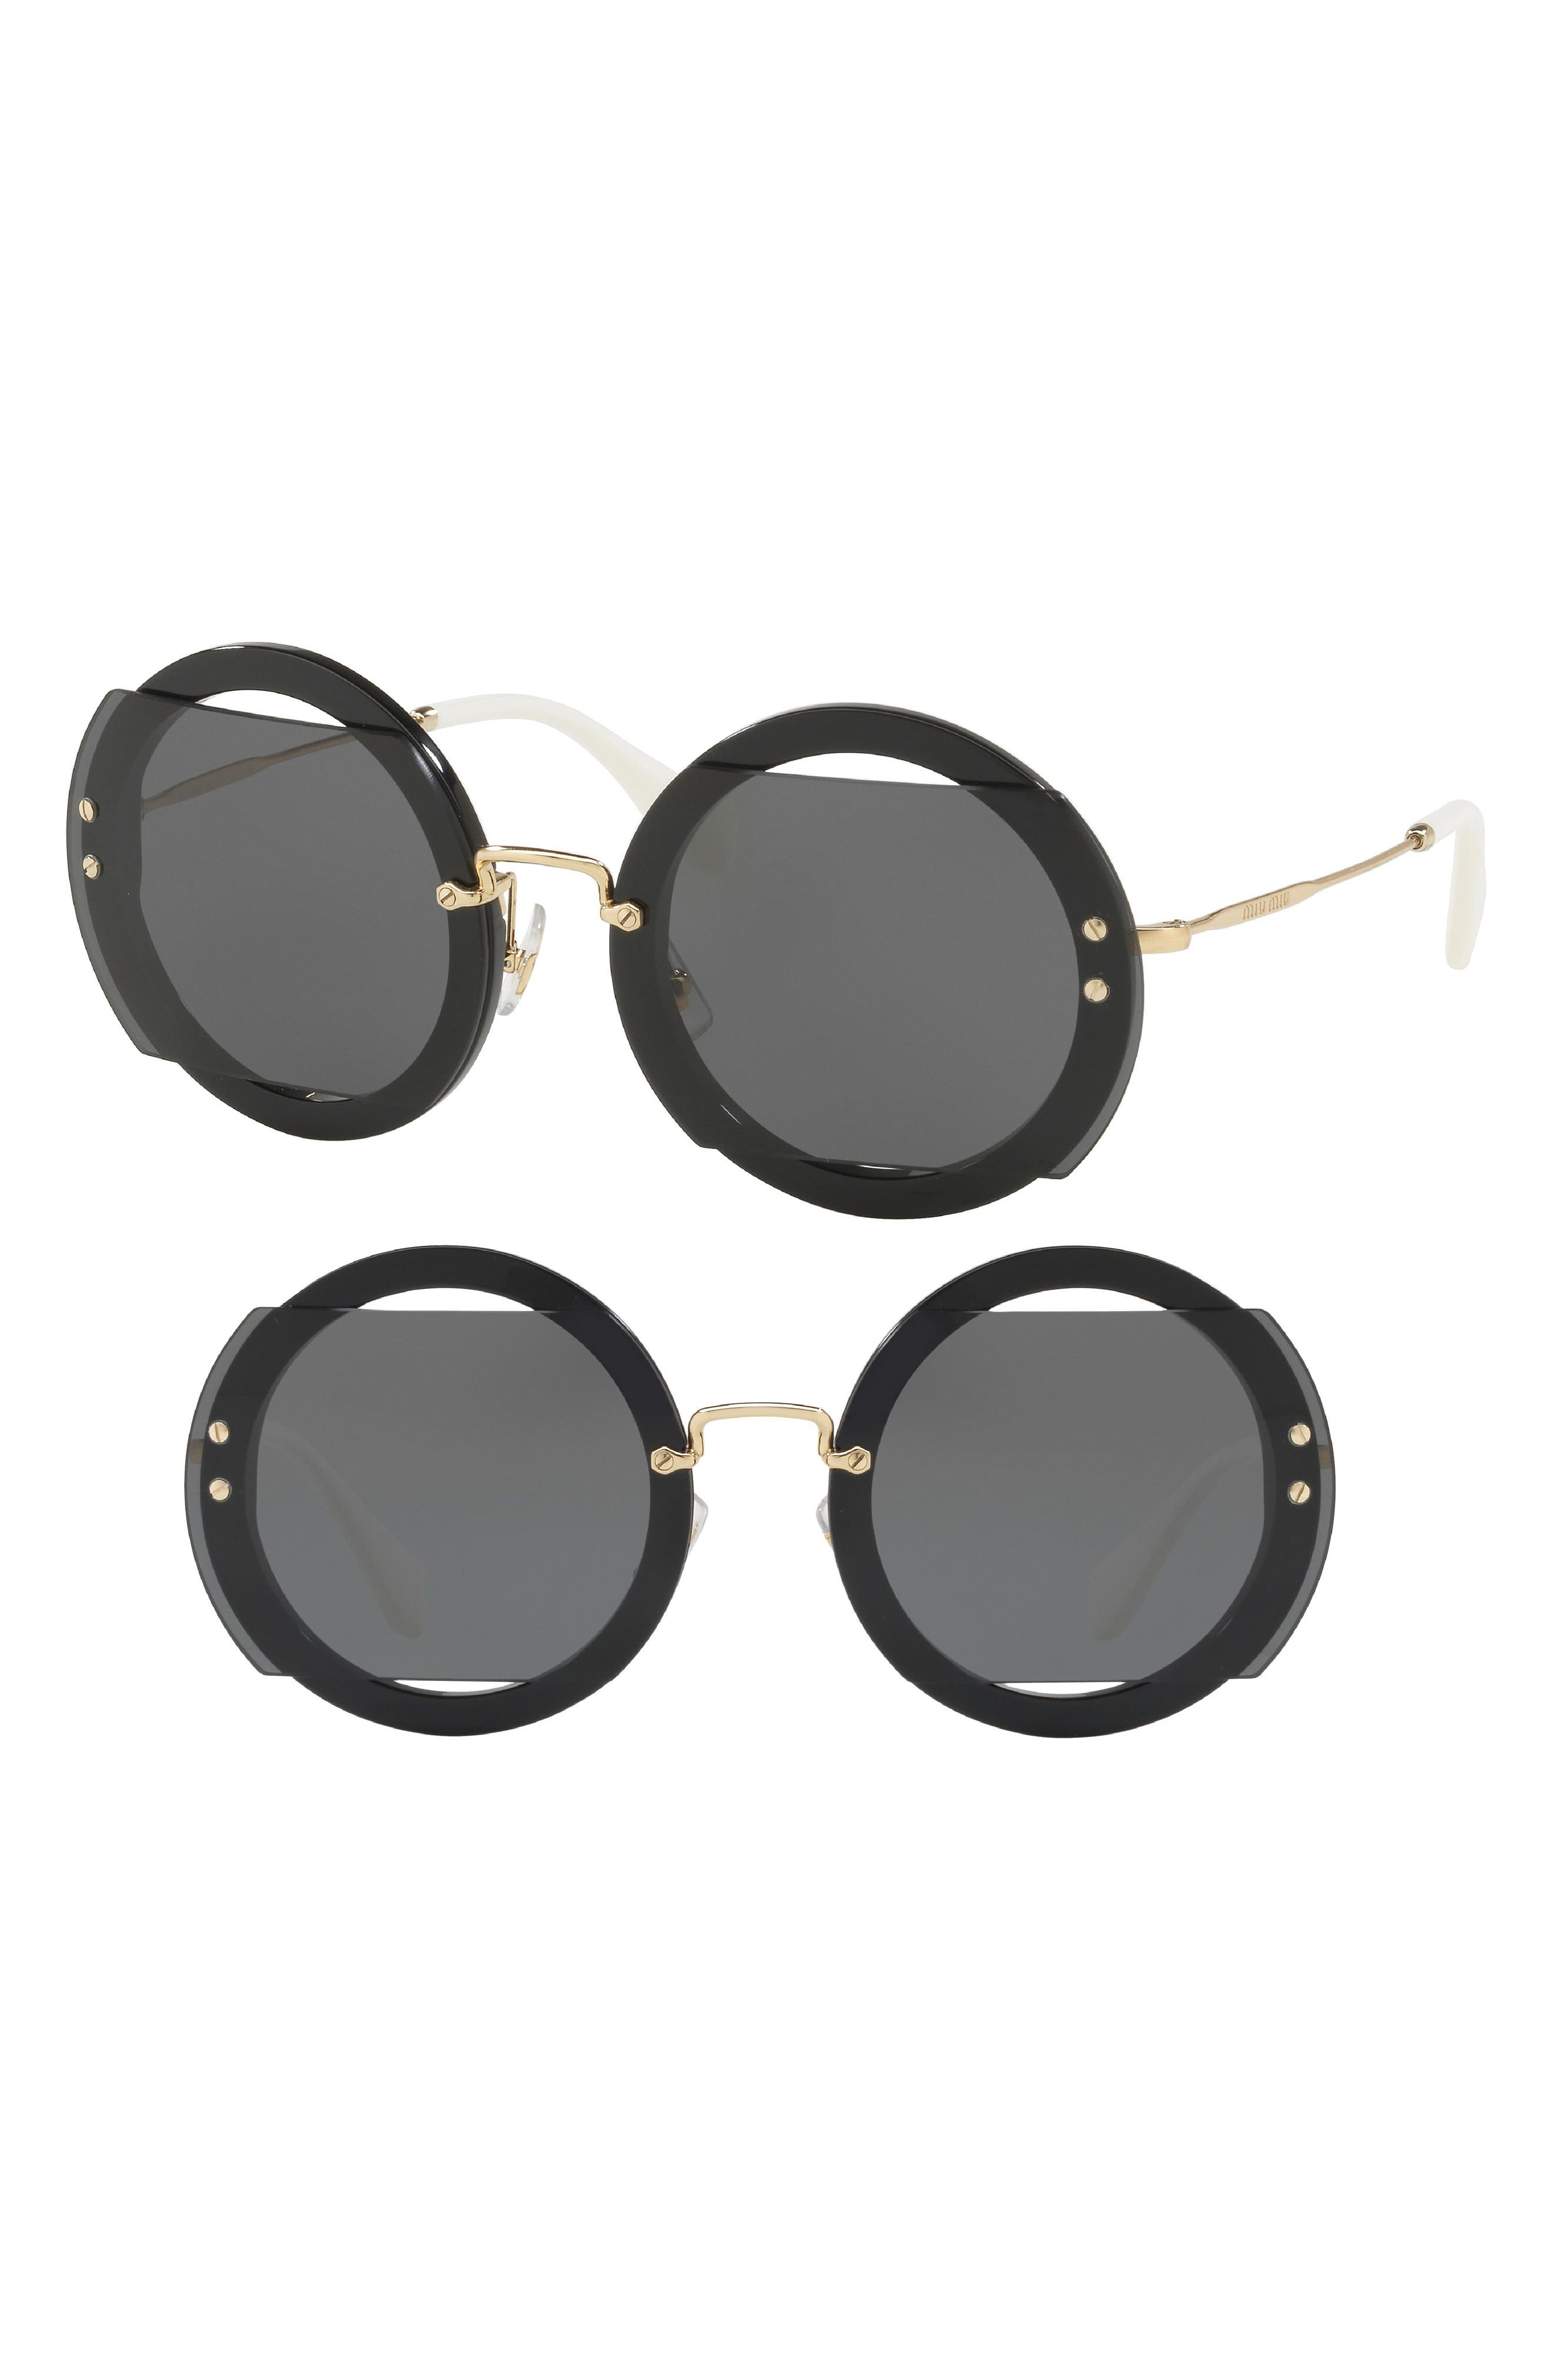 63mm Round Sunglasses,                         Main,                         color,